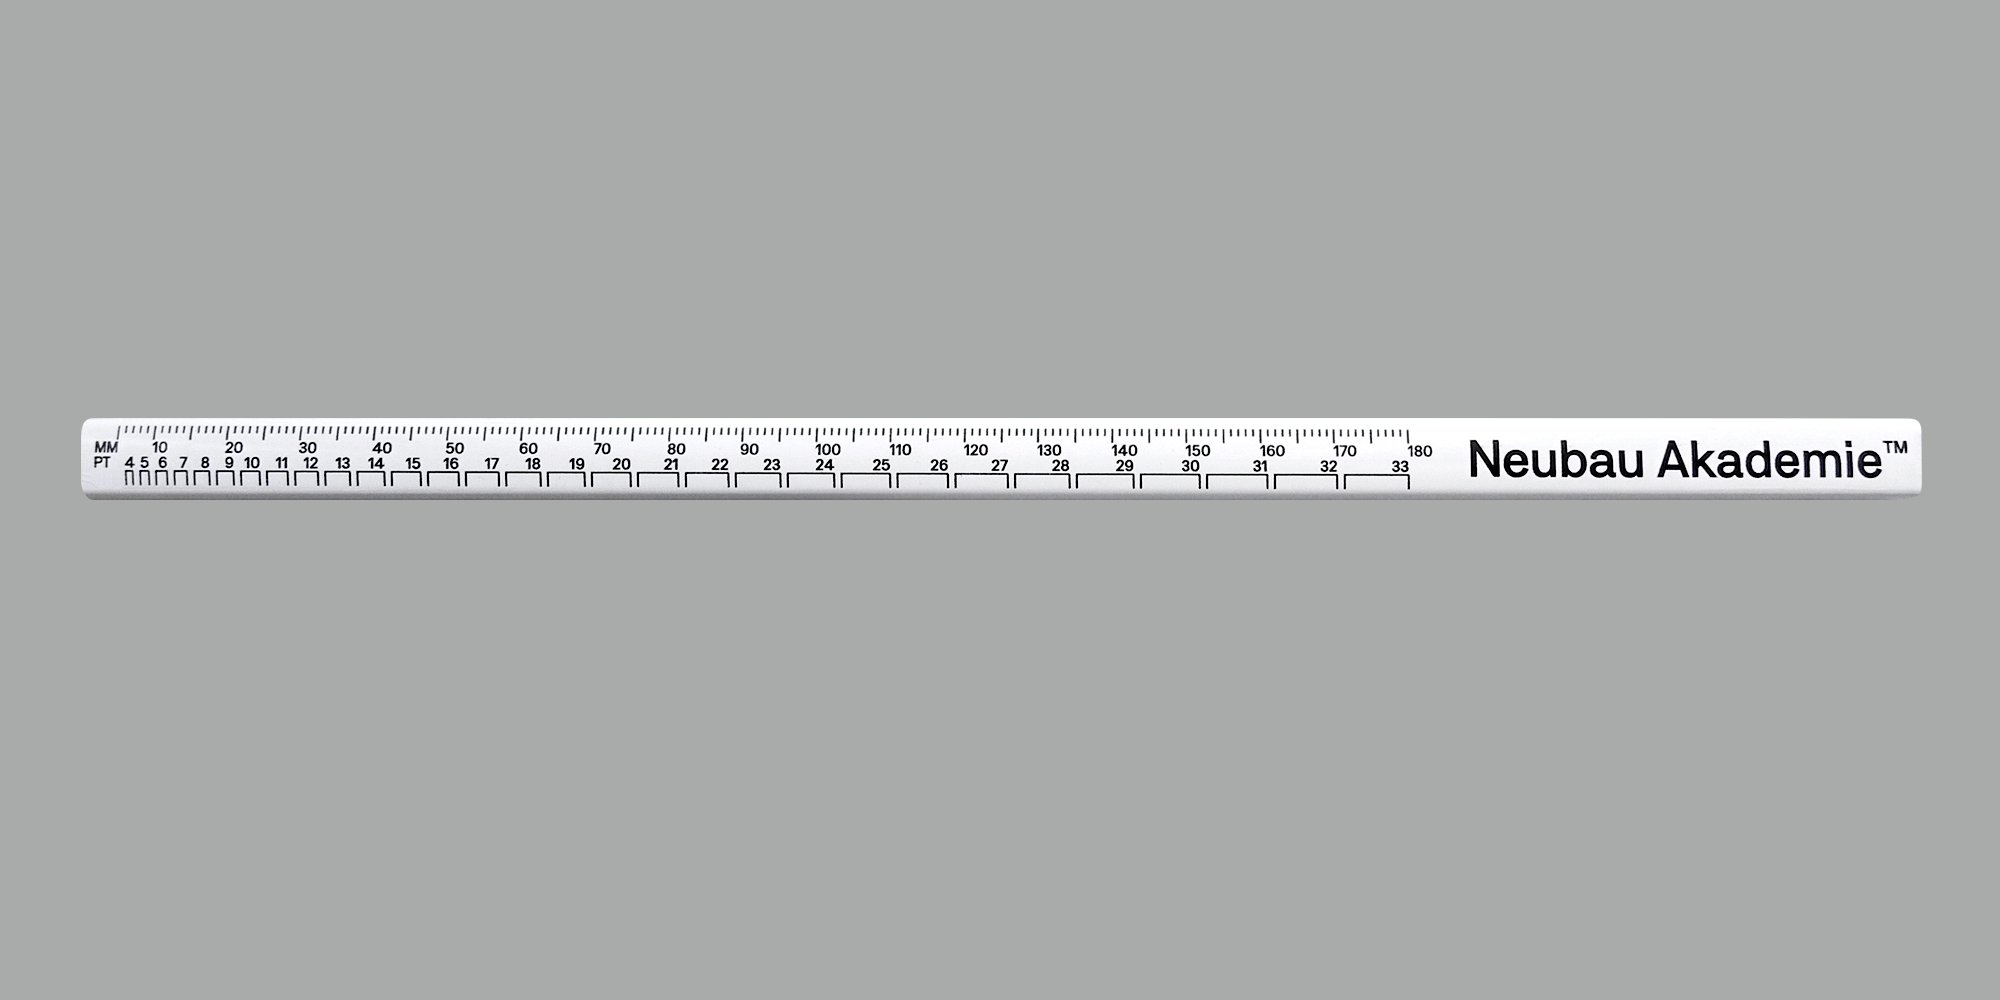 Neubau_Akademie_Typometer